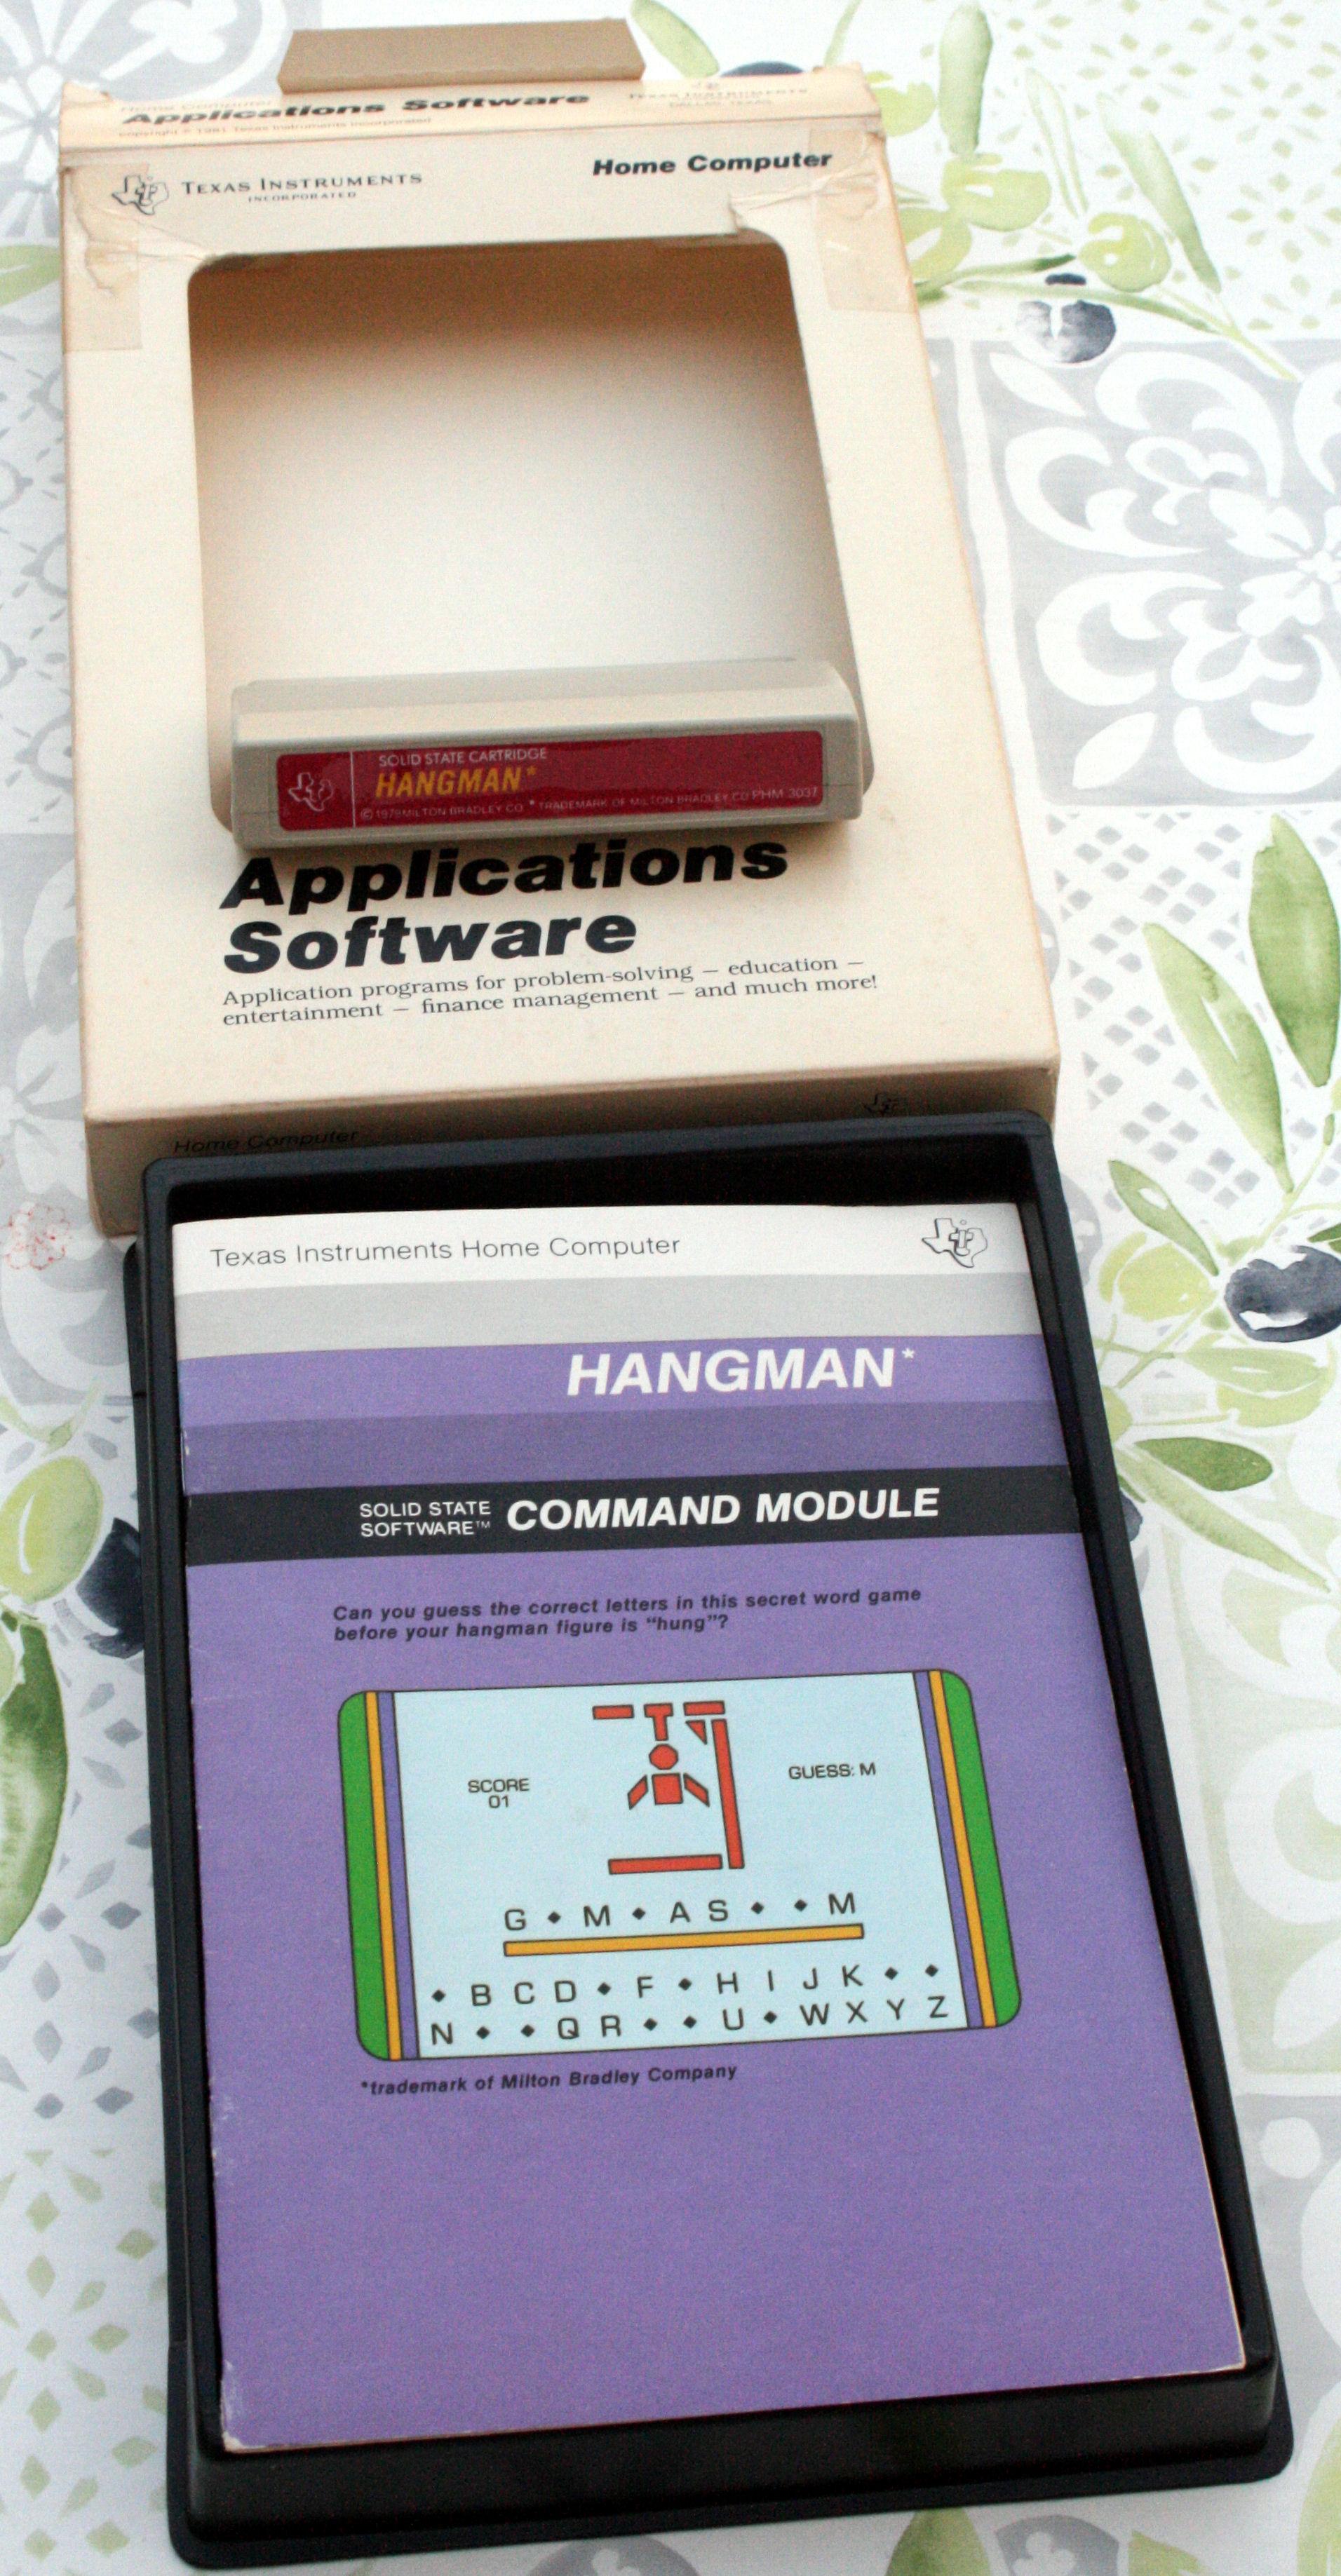 HangmanR1